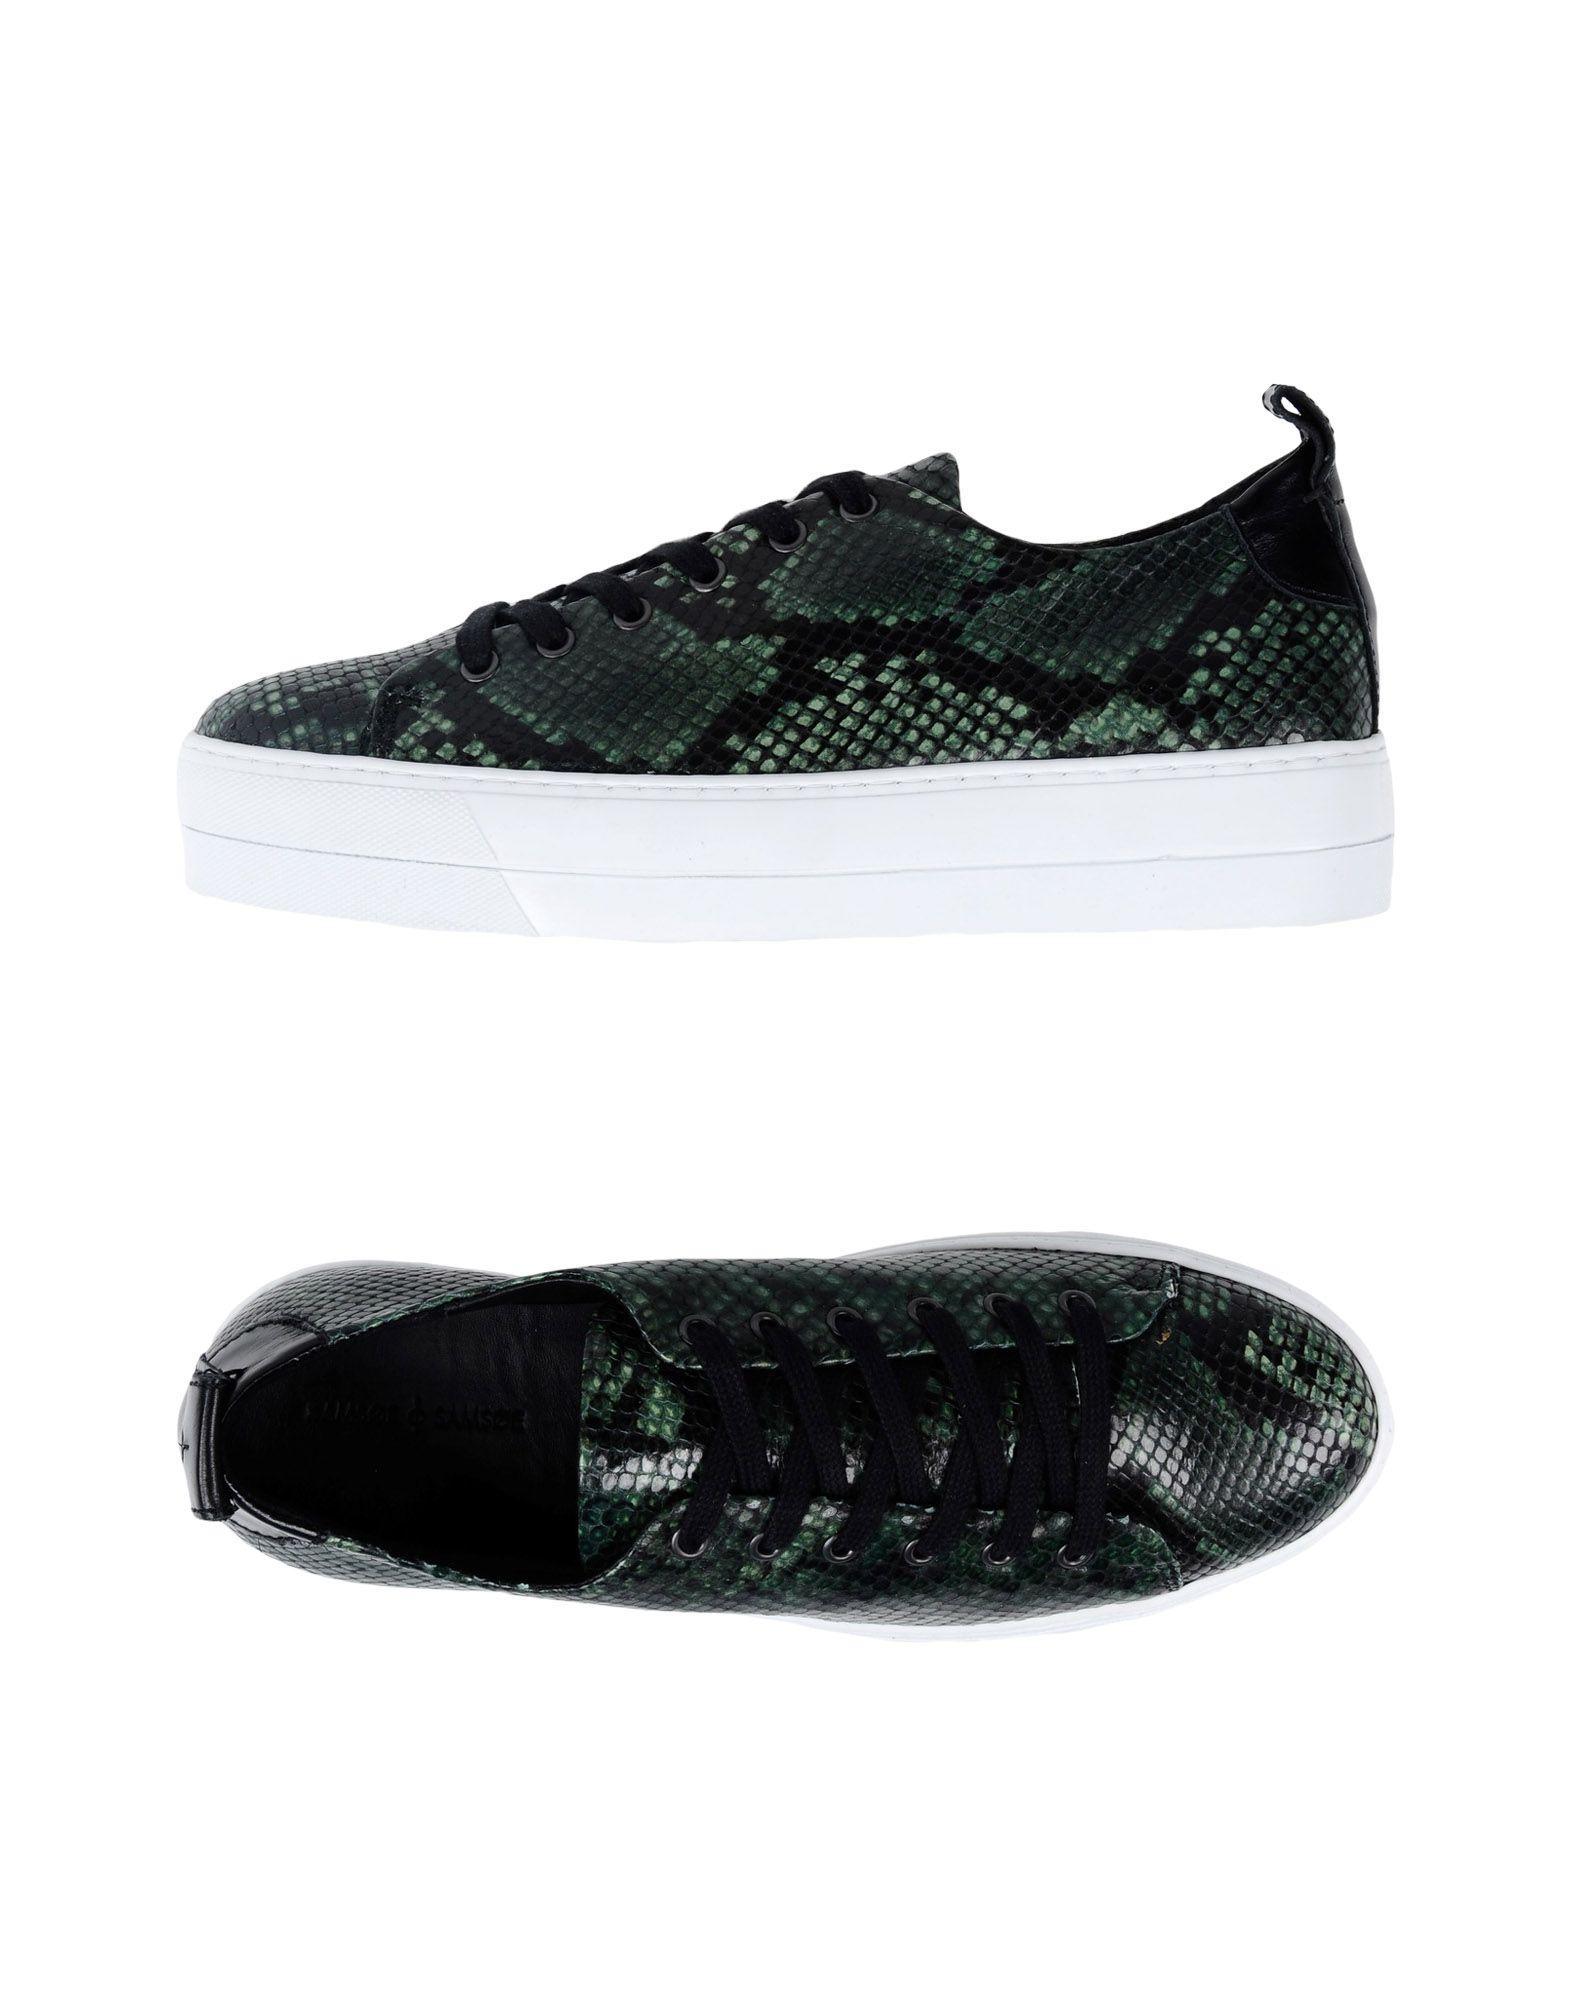 Samsøe Φ Samsøe Burma 9580 beliebte  11444112VS Gute Qualität beliebte 9580 Schuhe d432ca